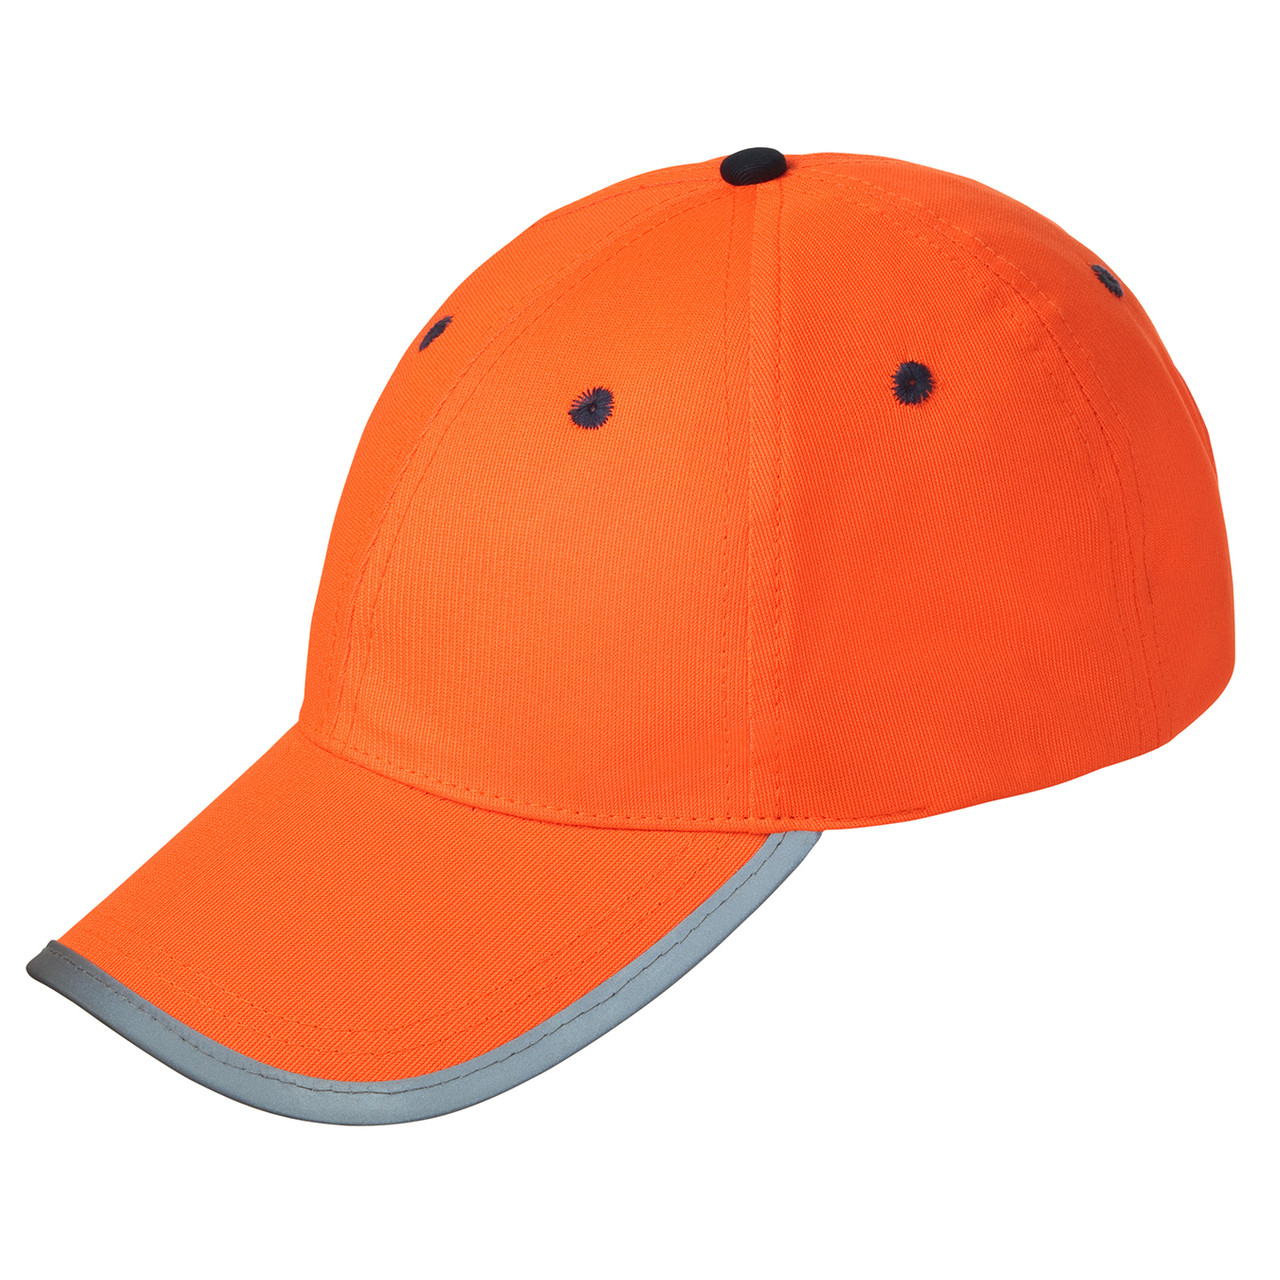 c8ebb34b01e473 147 Orange Hi-Viz Ball Cap | Safetywear.ca